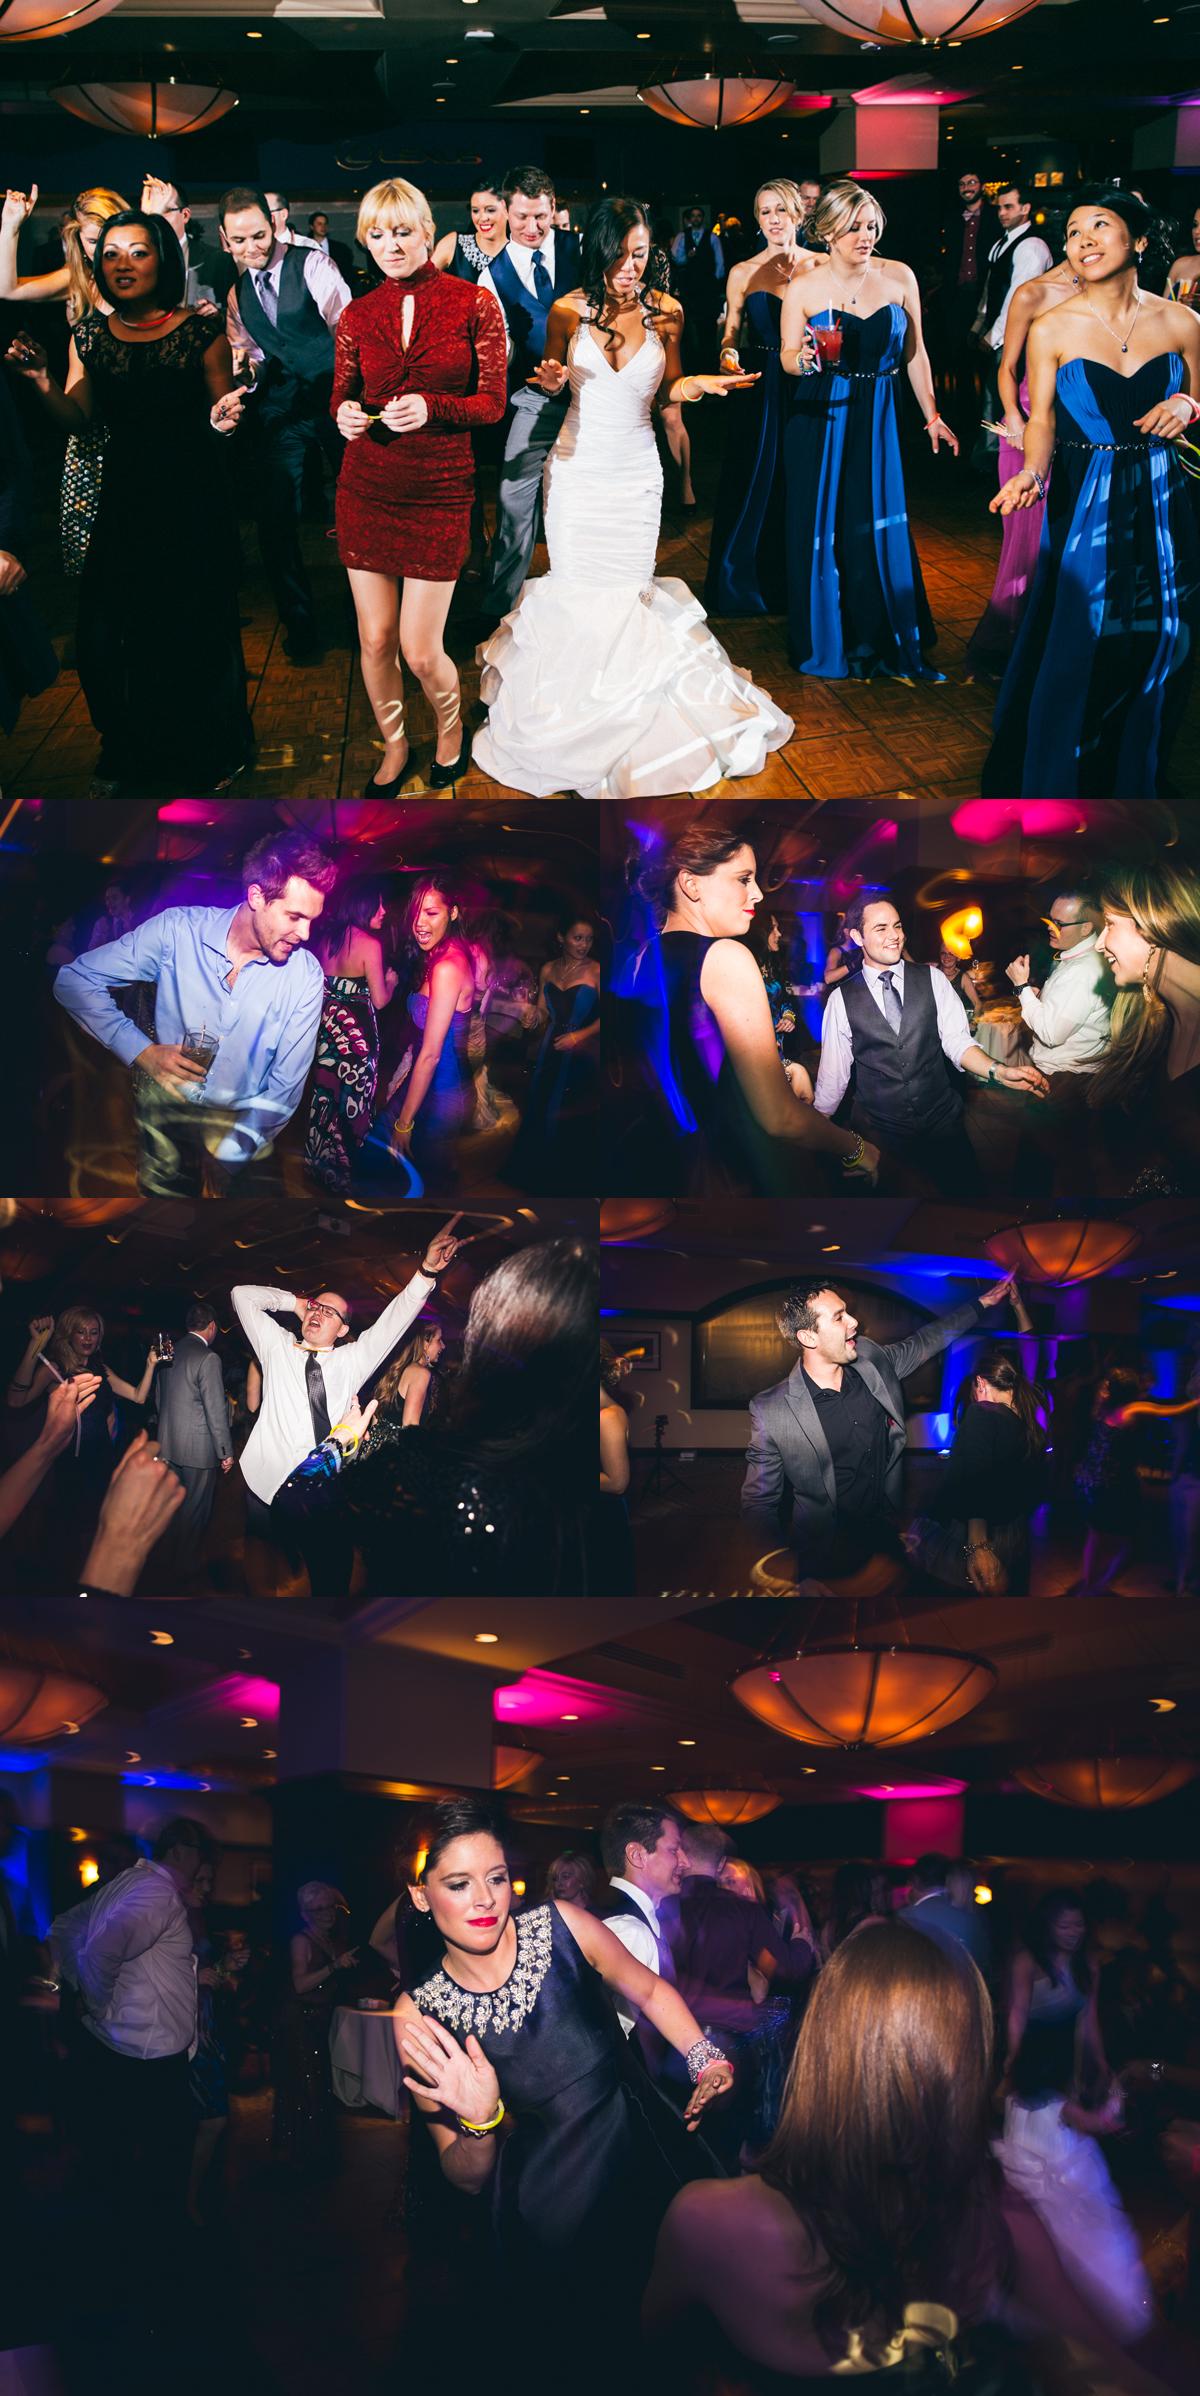 pittsburgh-wedding-photographer-kimly-james-heinz-chapel-pnc-lexus-club-tea-ceremony-20